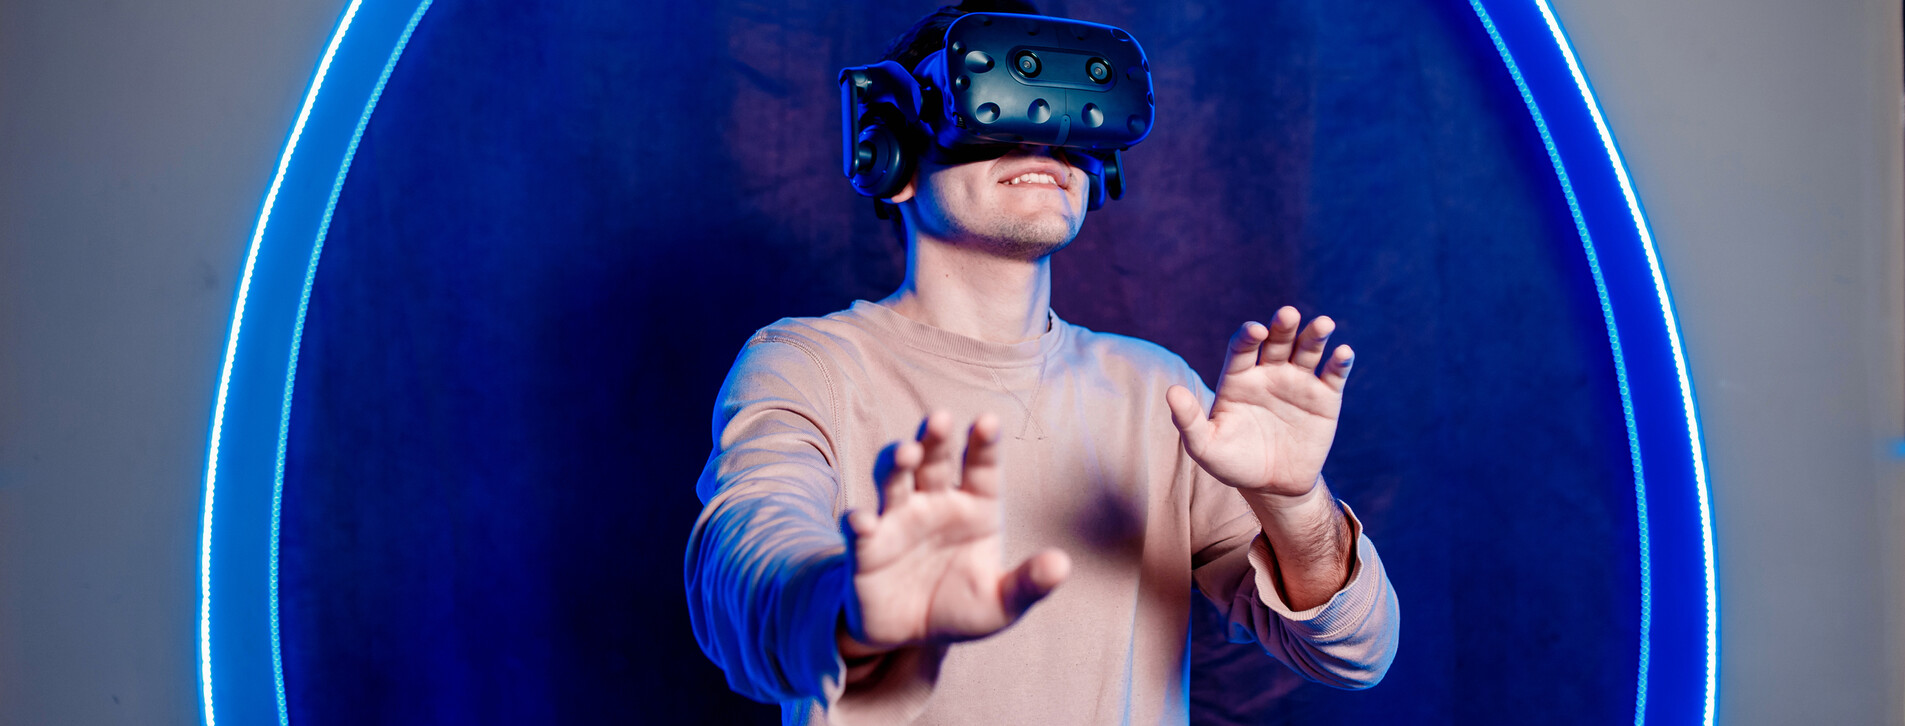 Фото 1 - VR-квест для компании